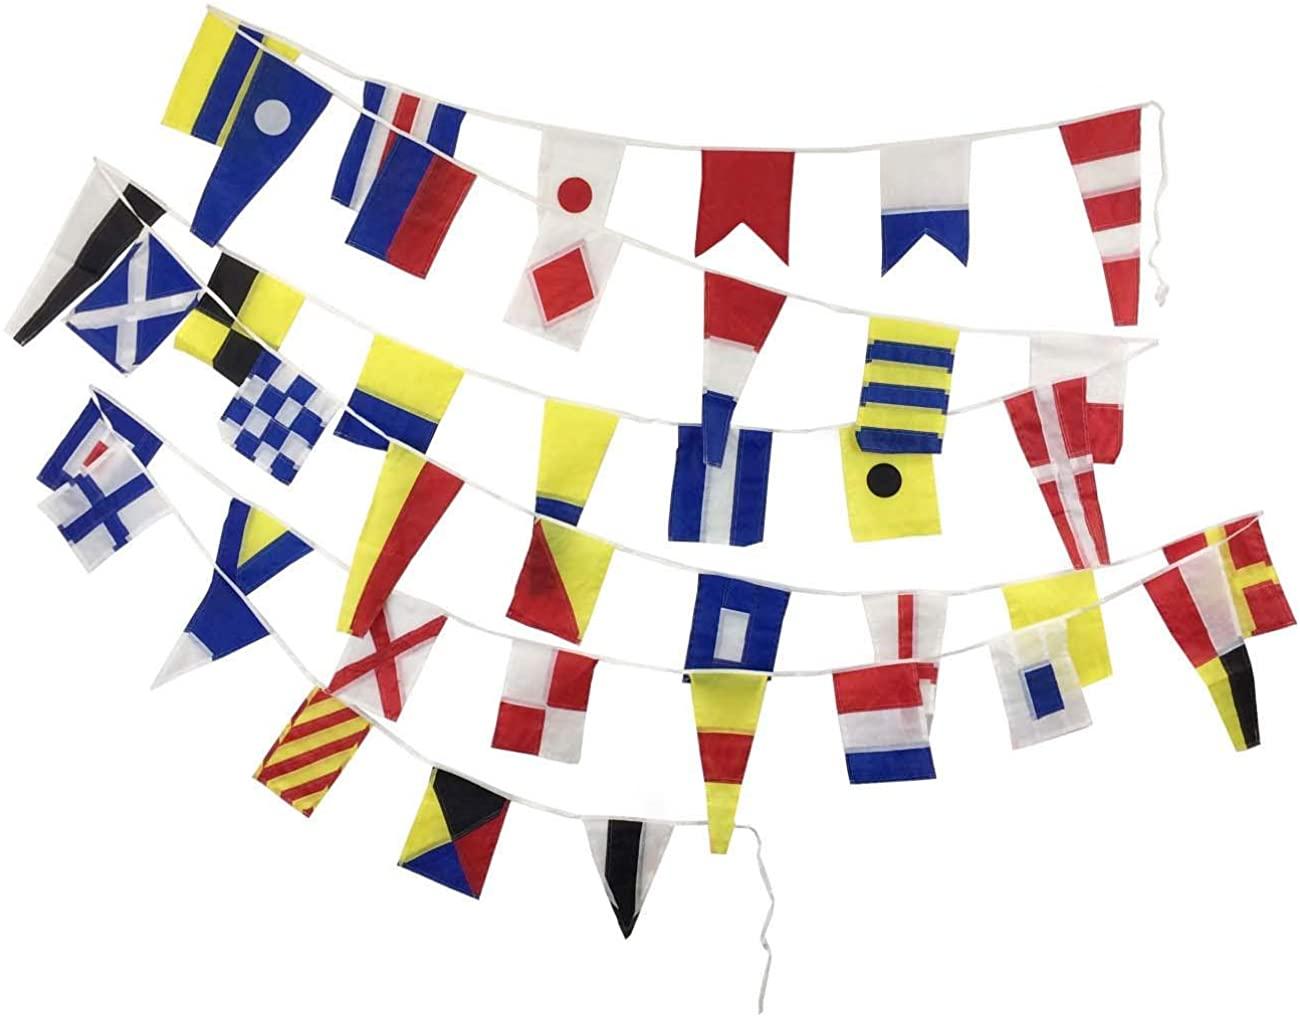 Brass Blessing International Maritime Bunting Signal Flags - Marine/Boat/Yacht/Beach Party Nautical Decor: